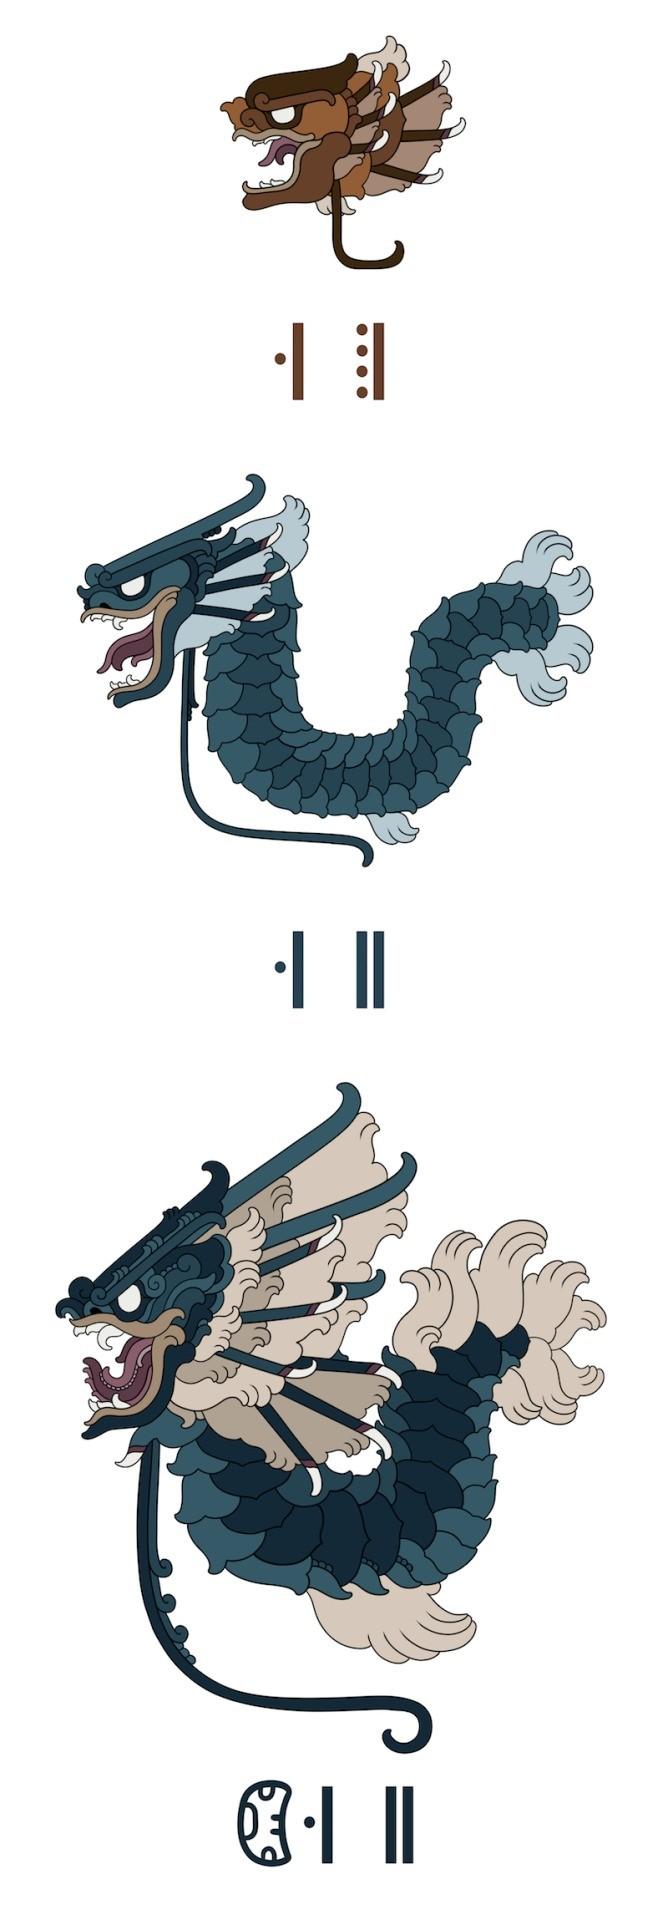 The Deadliest Sea Best. .. 8====)=3 another deadly beast